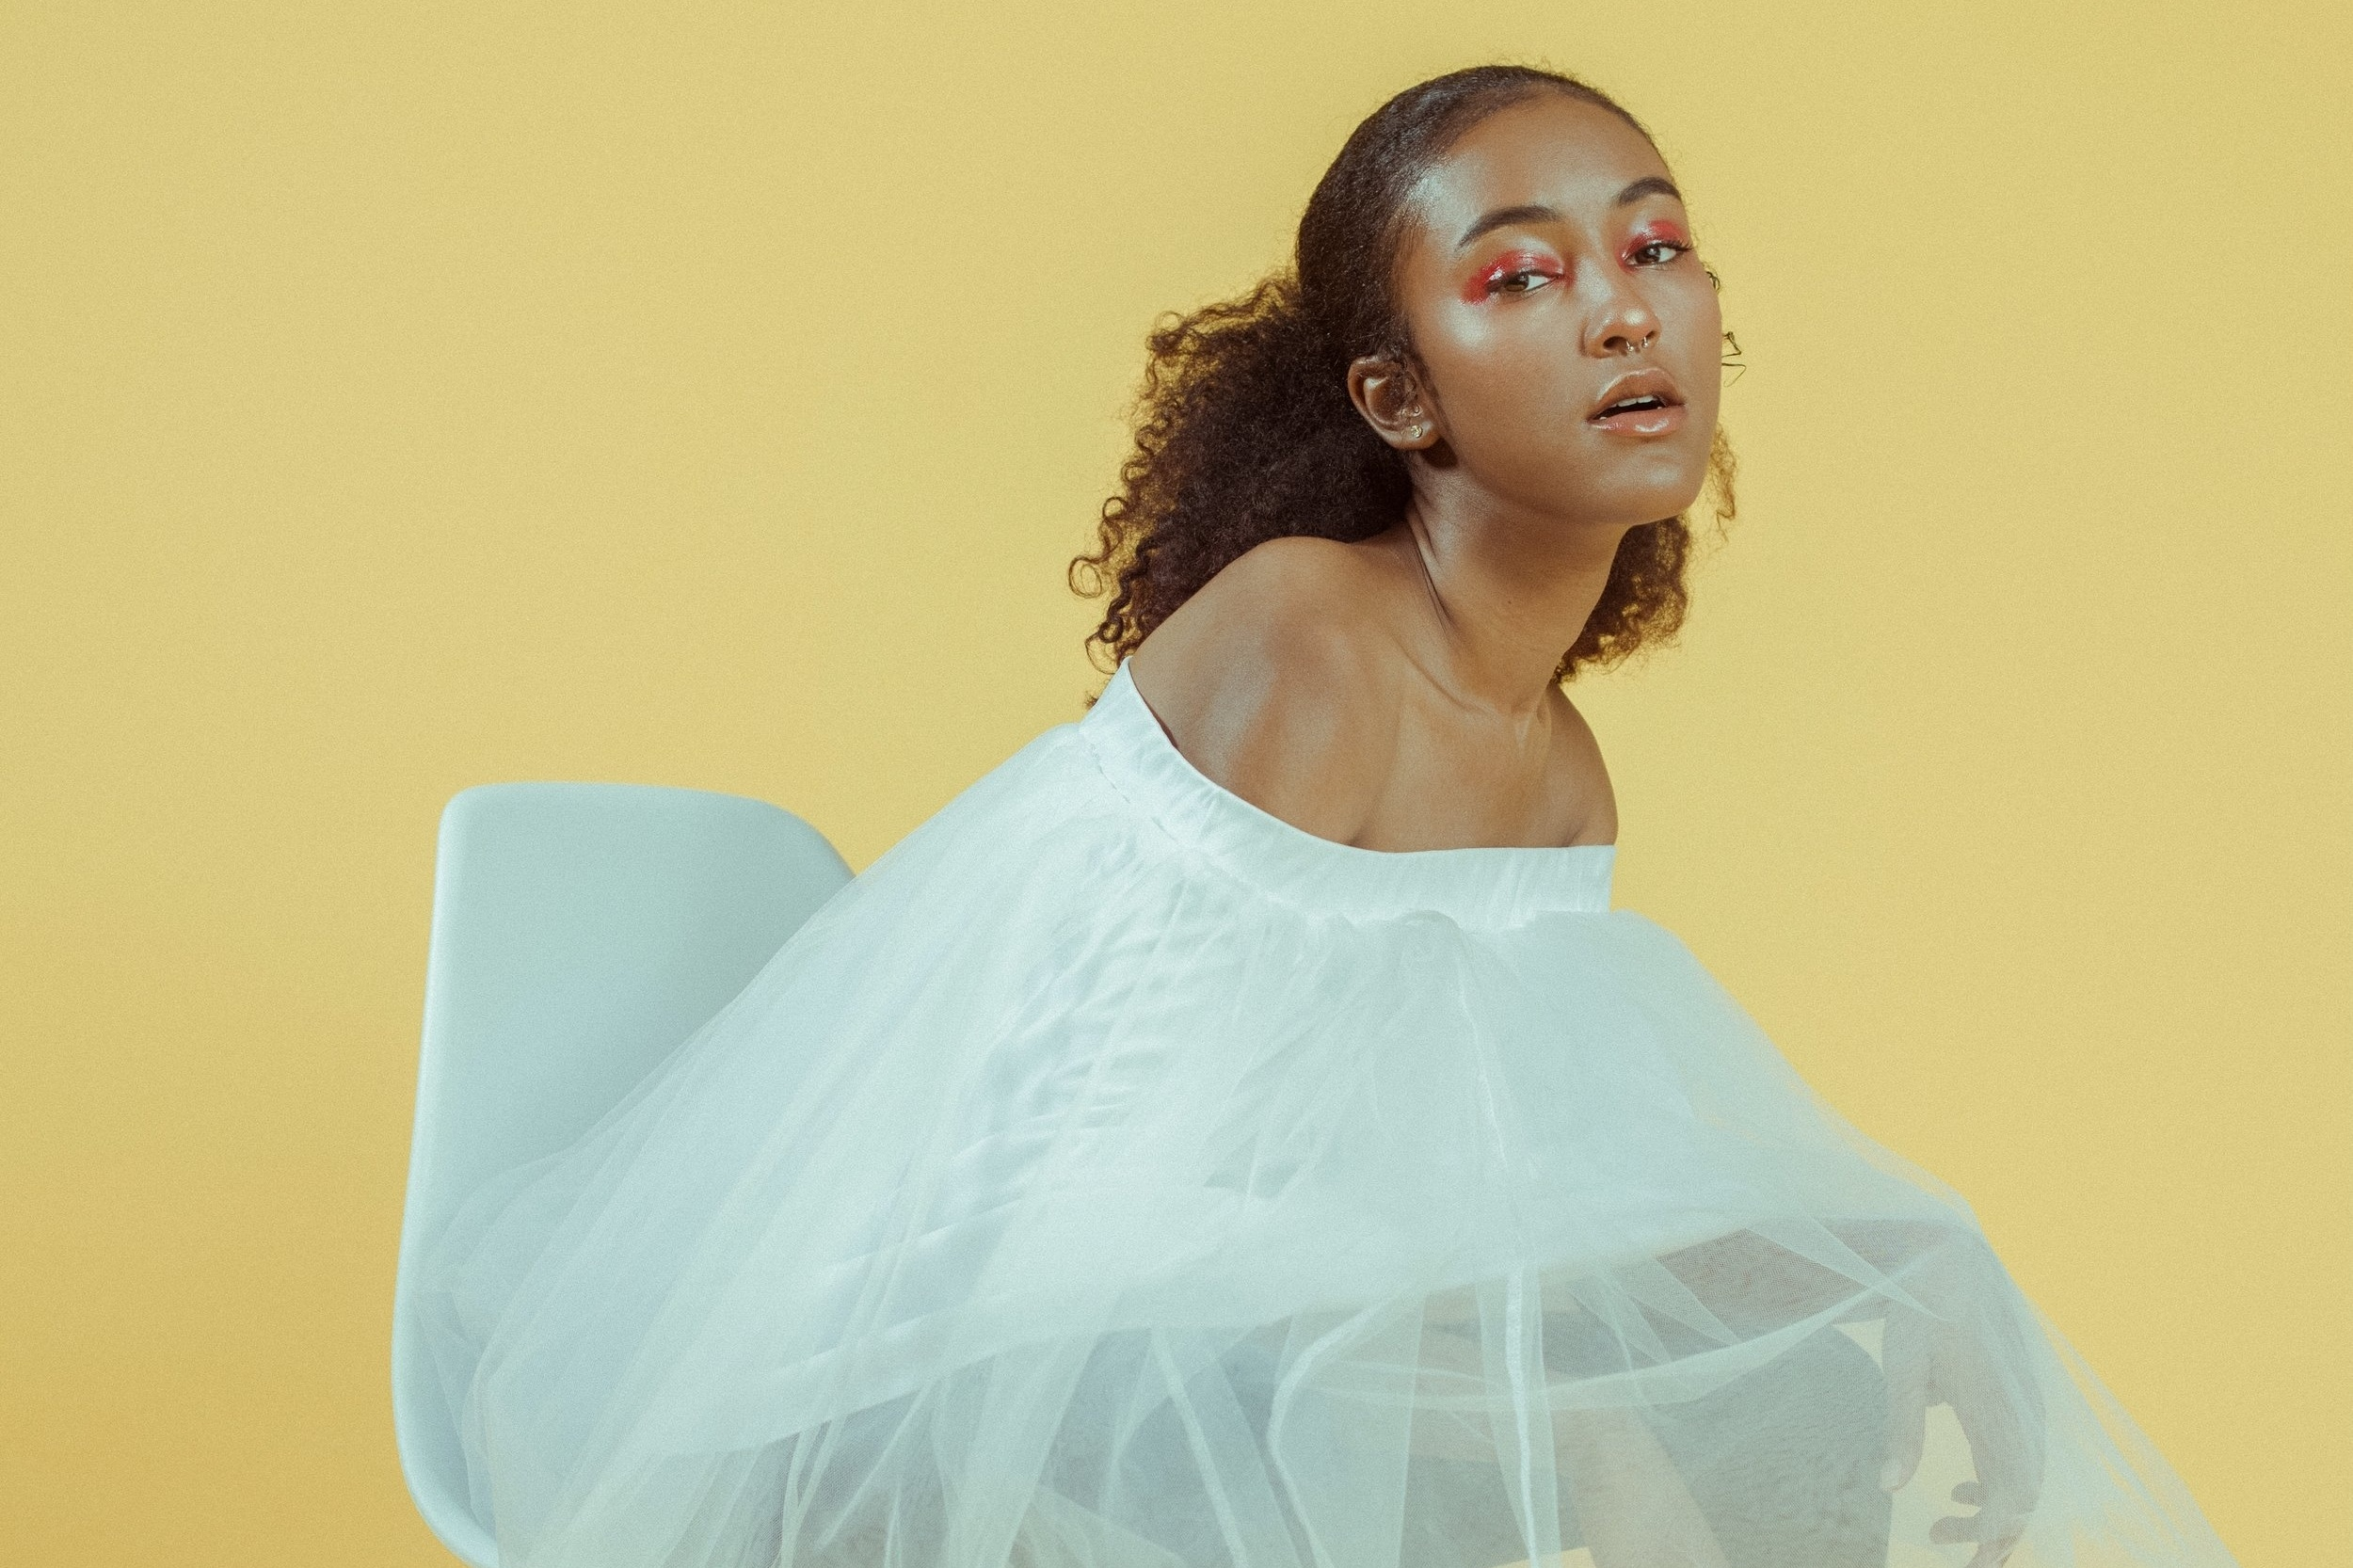 fatale // september 2017 - art direction + wardrobe: piera moore // photographer: nisshoots // model: piera moore